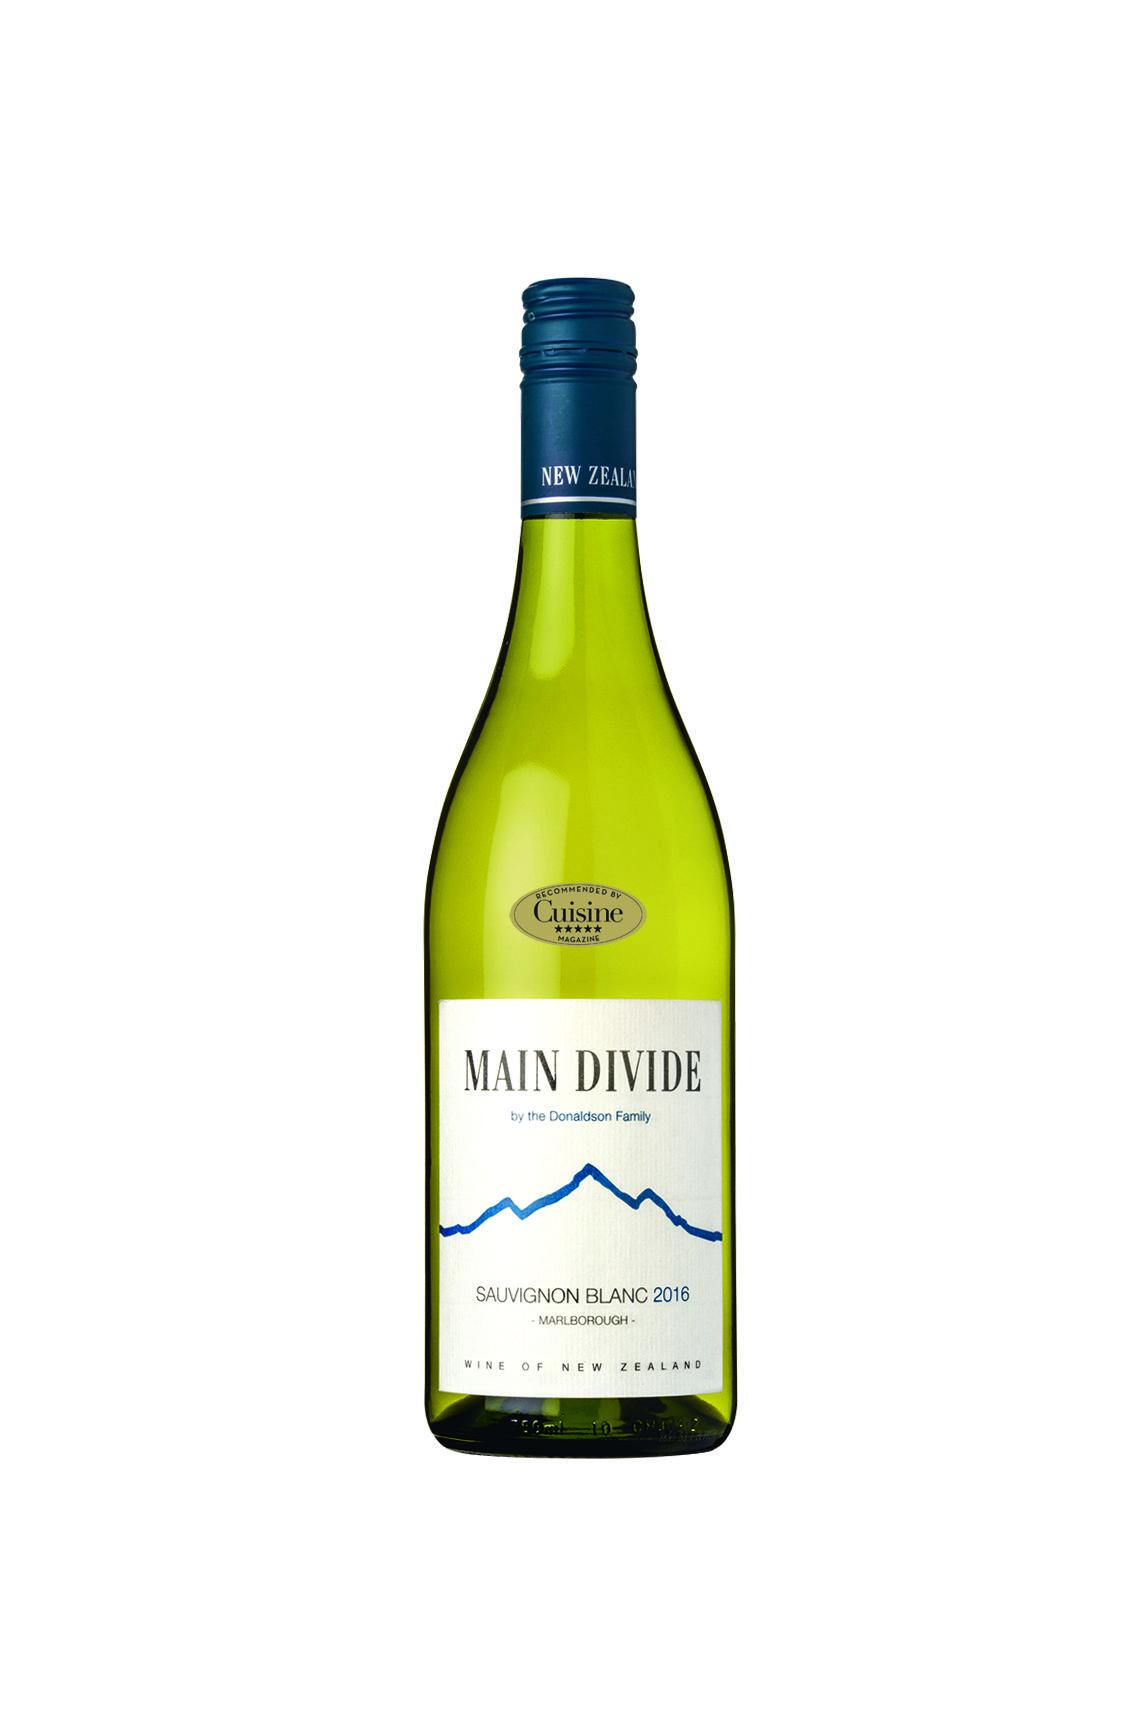 Main Divide Sauvignon Blanc 2016